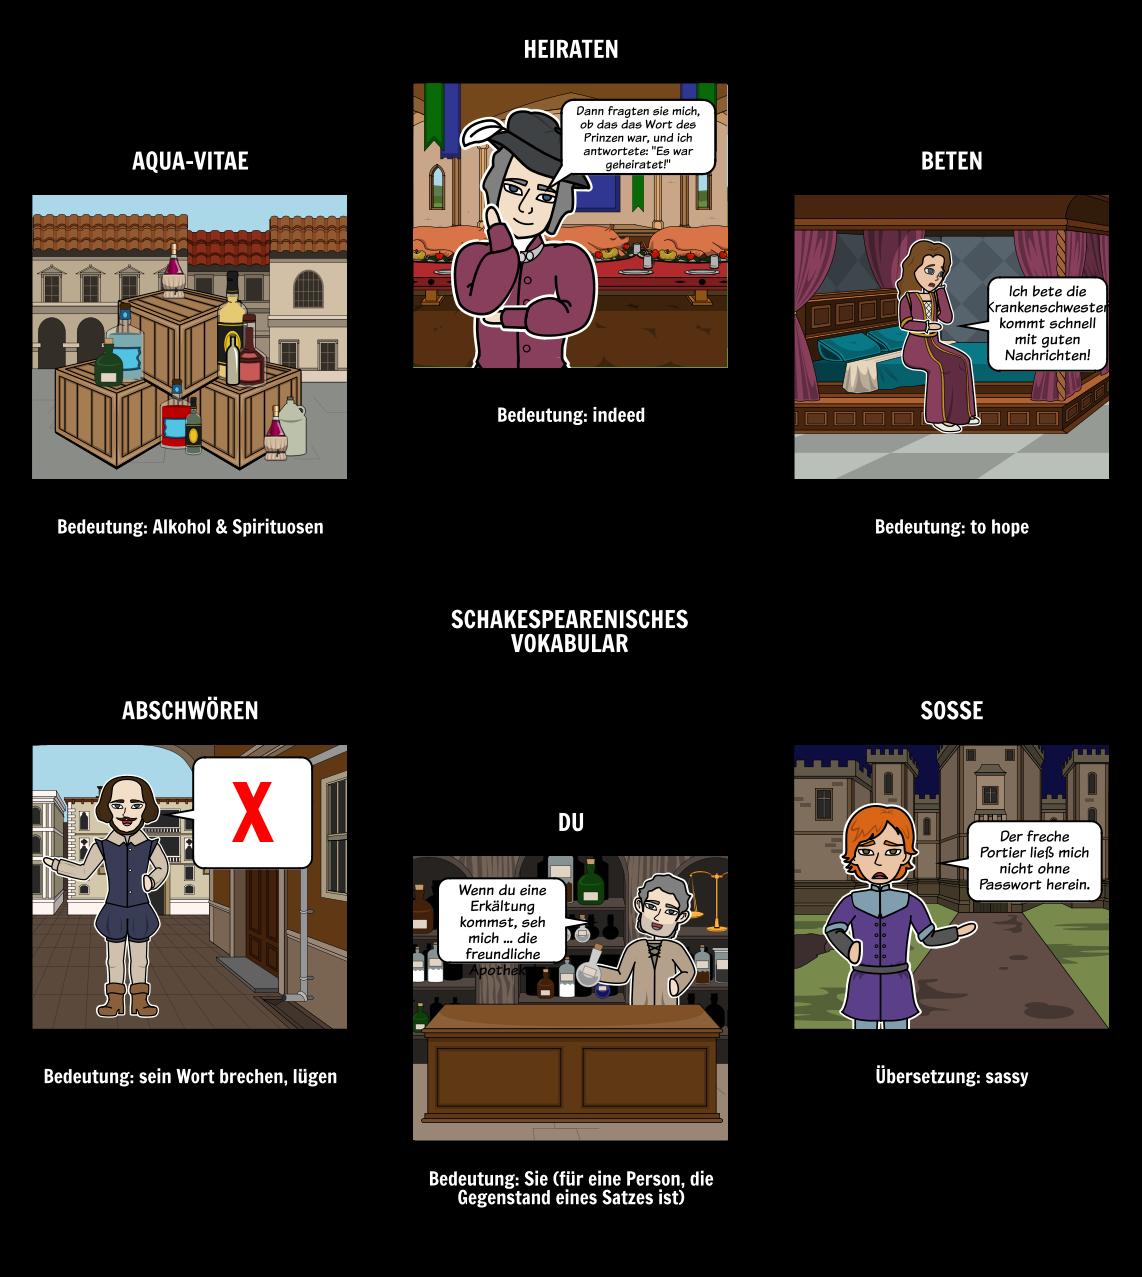 Shakespeare-Wortschatz